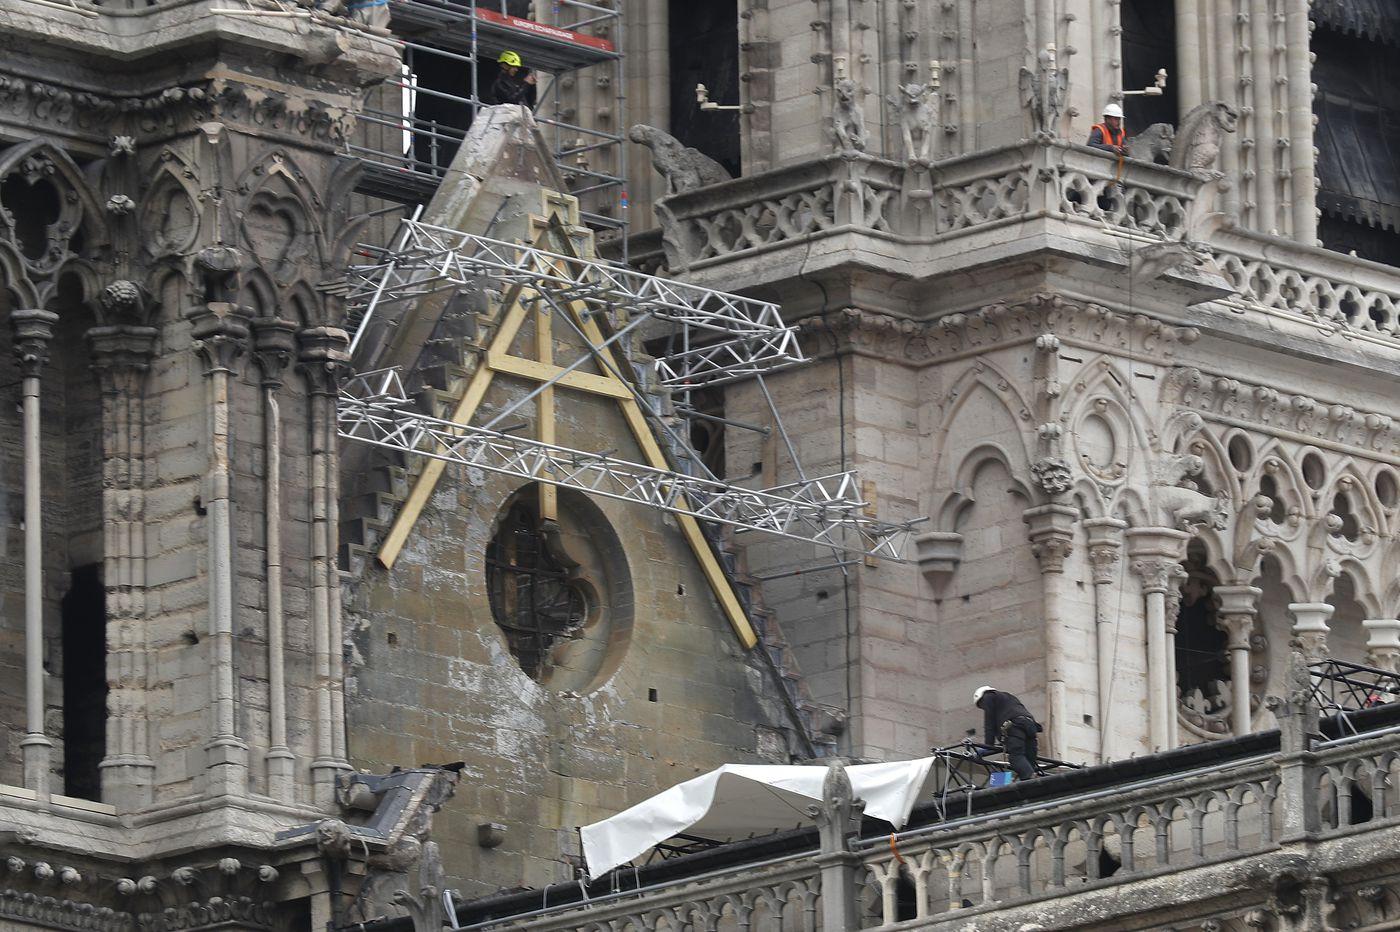 To restore Notre Dame, we must restore its fundamental purpose | Marc Thiessen